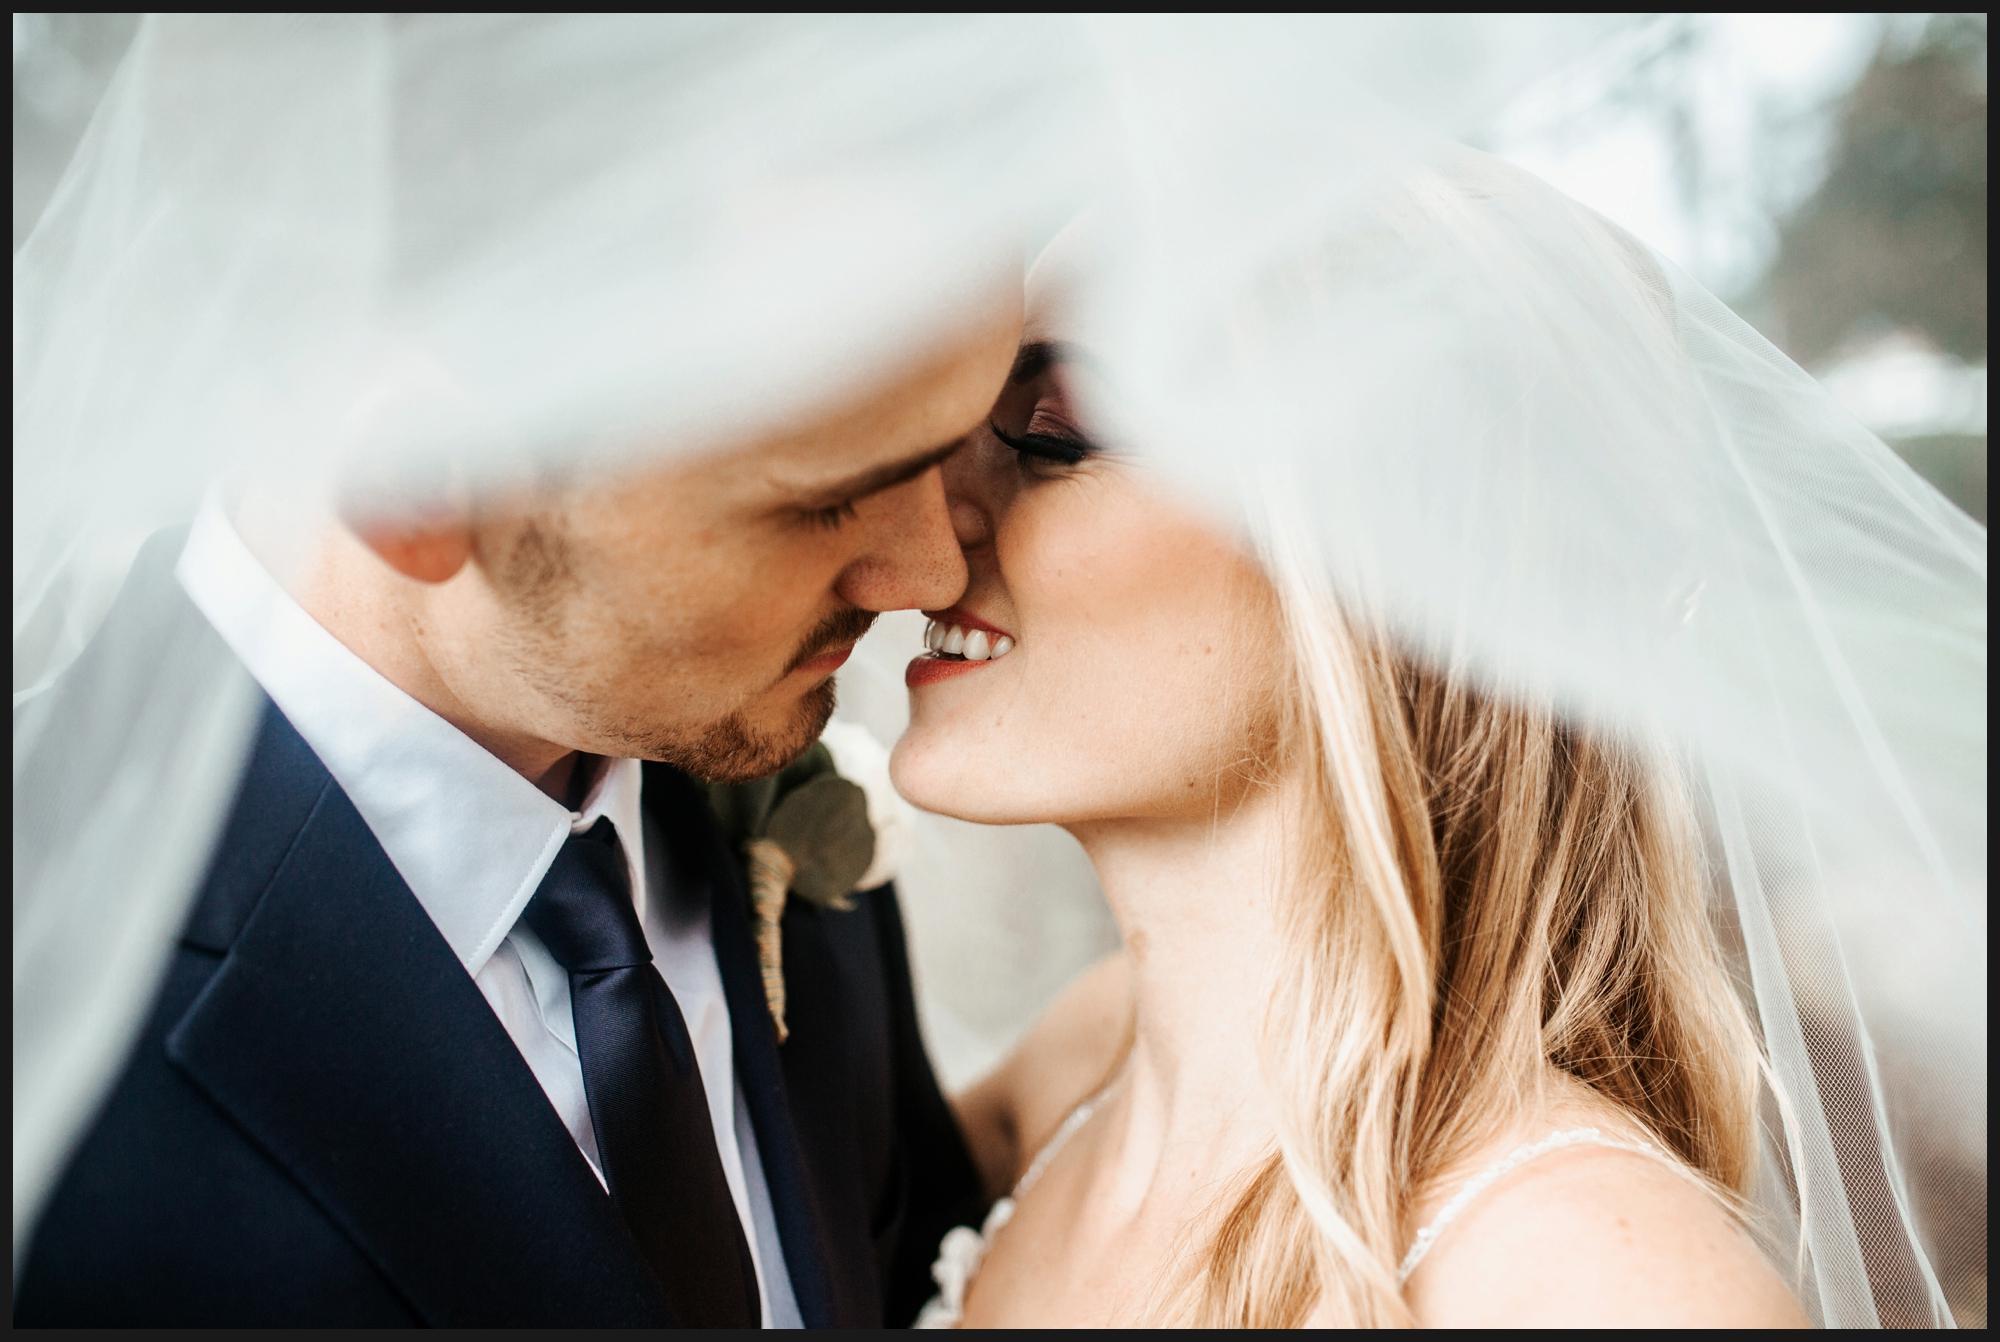 Orlando-Wedding-Photographer-destination-wedding-photographer-florida-wedding-photographer-bohemian-wedding-photographer_0100.jpg